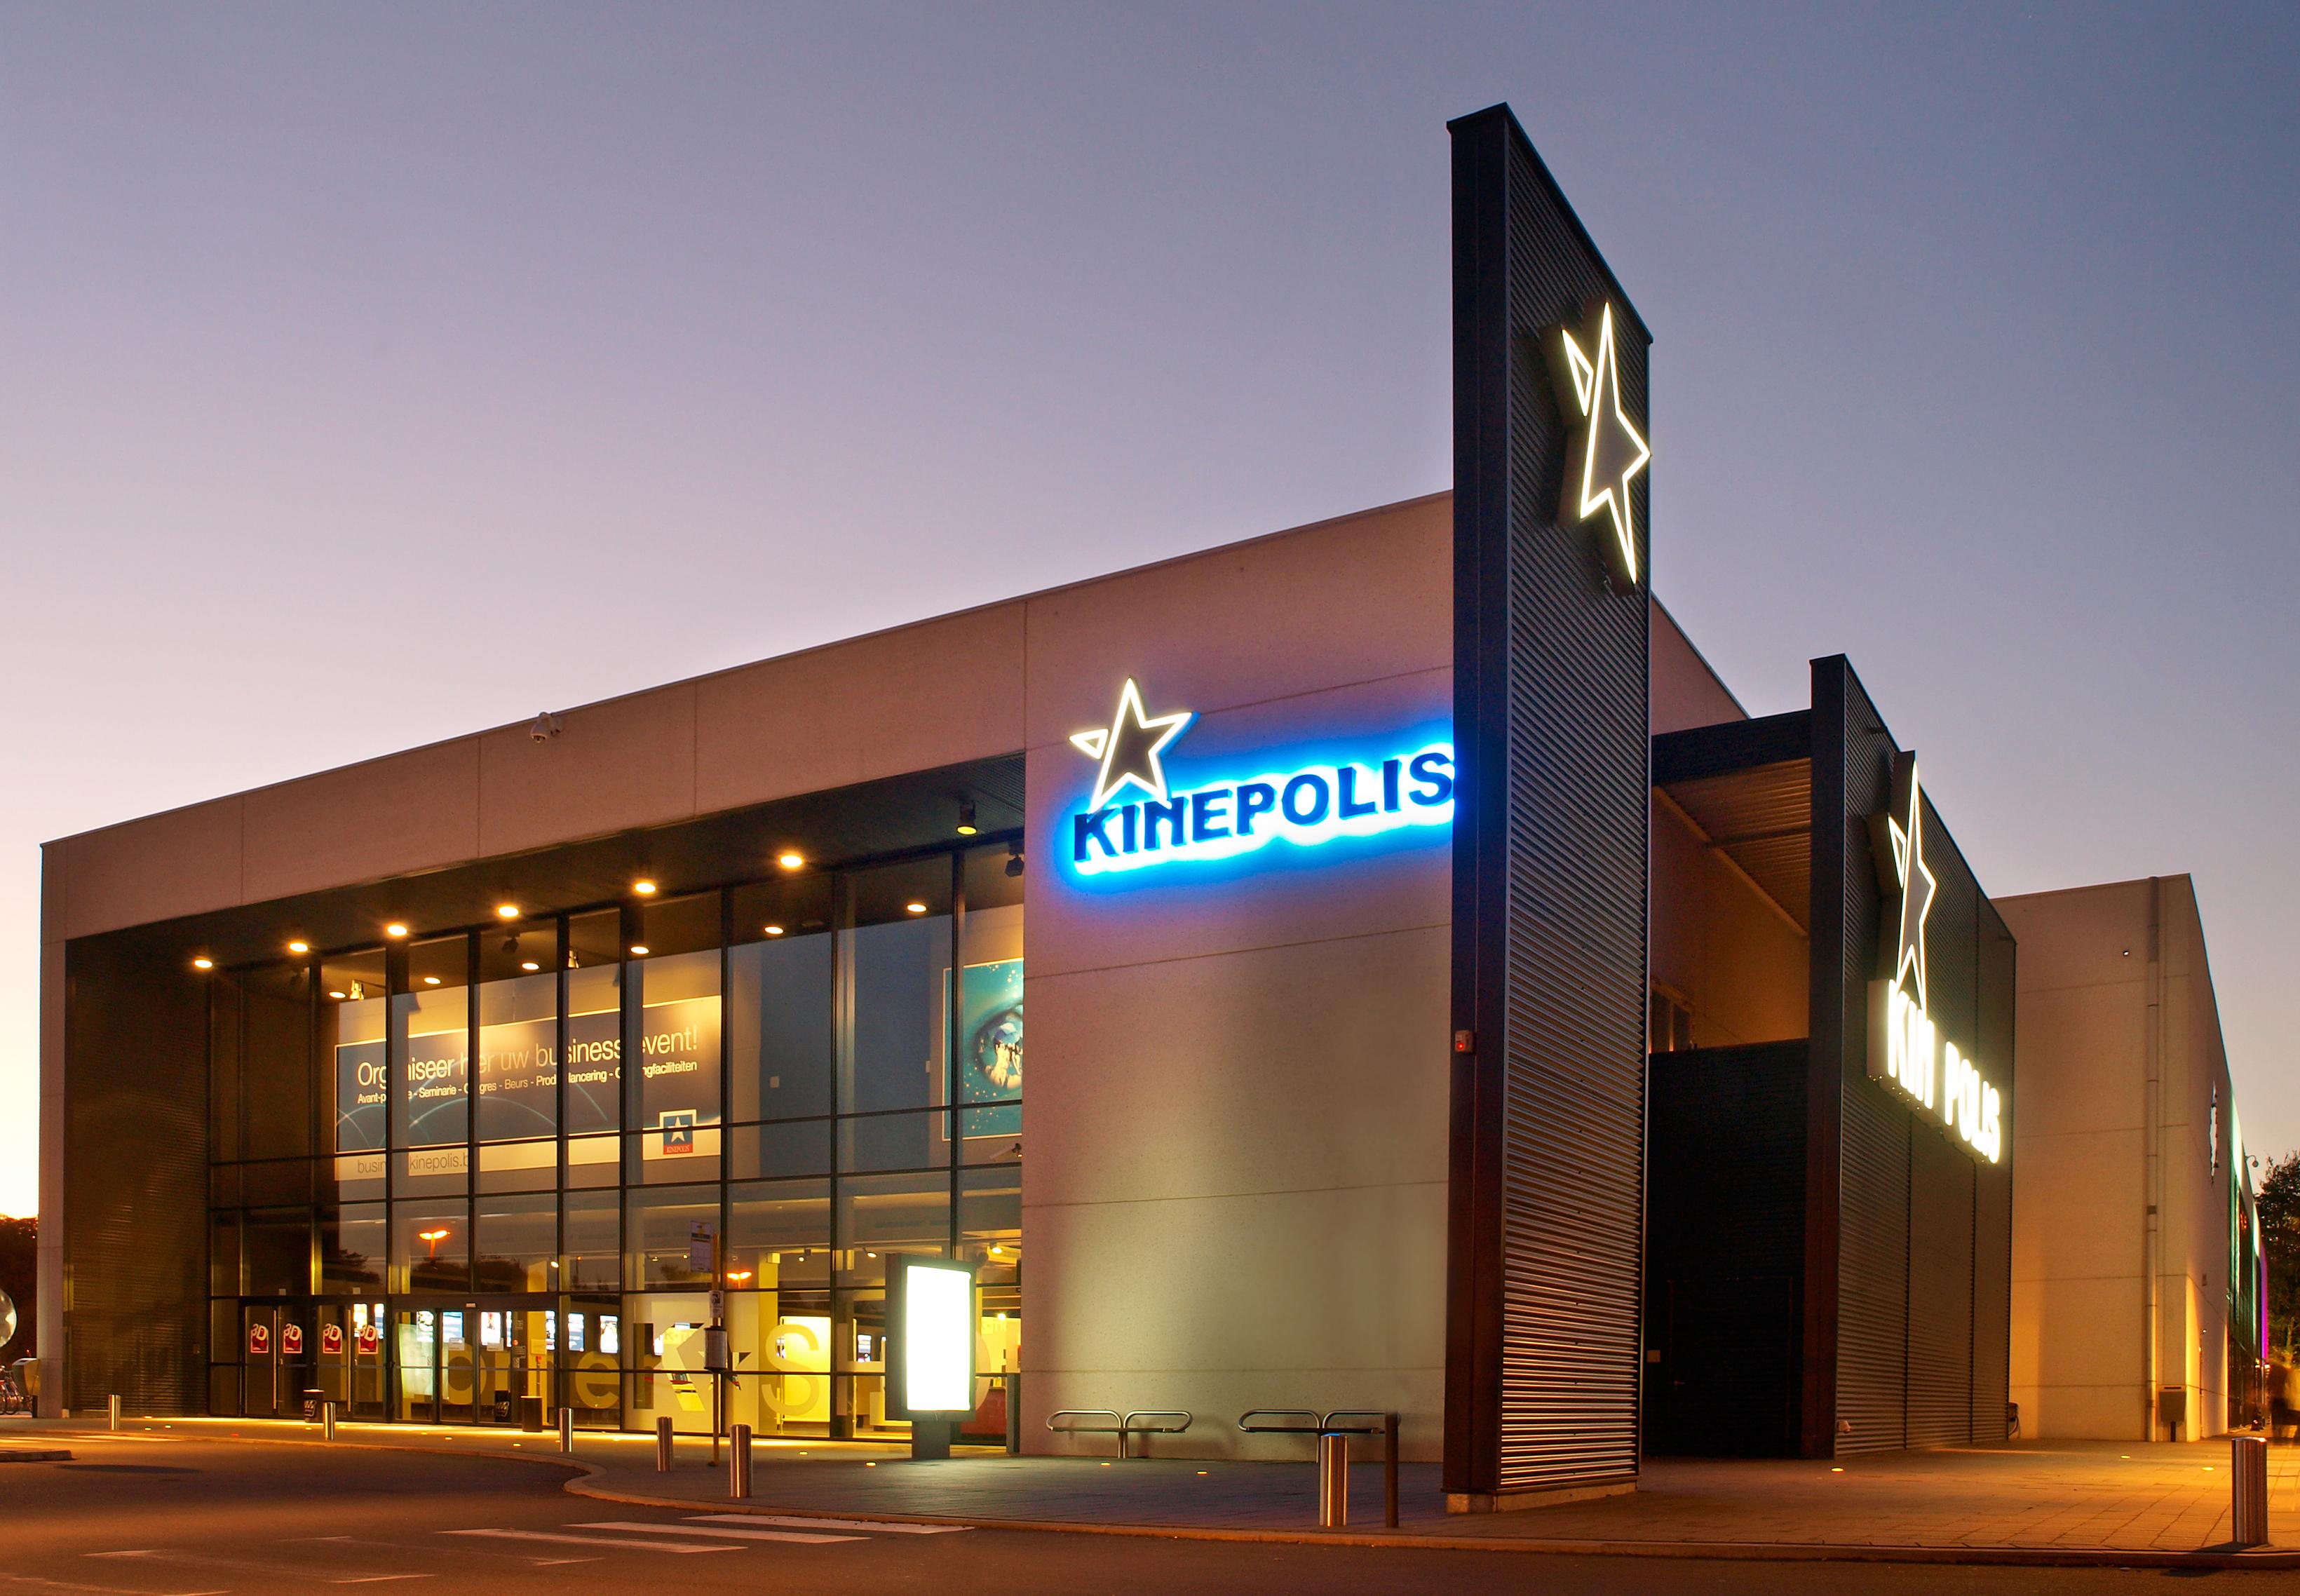 Kinepolis Brugge (4)